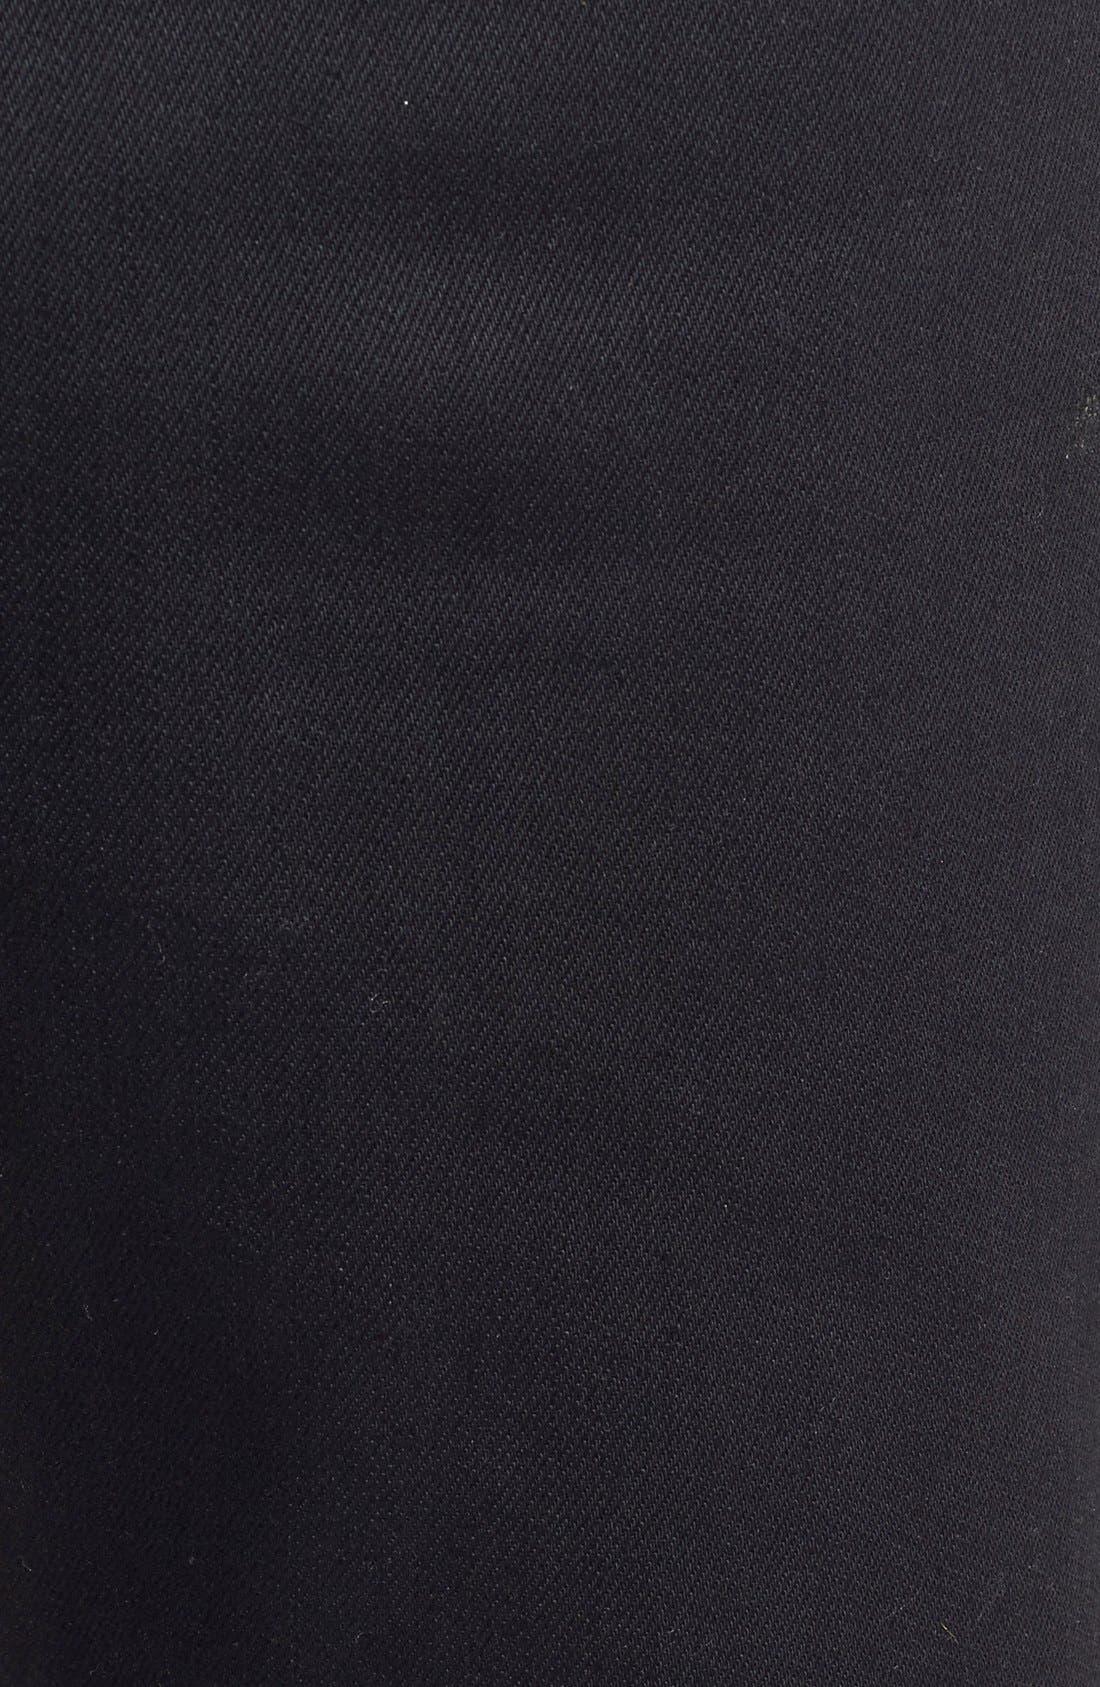 NUDIE JEANS,                             'Grim Tim' Slim Fit Raw Selvedge Jeans,                             Alternate thumbnail 3, color,                             001